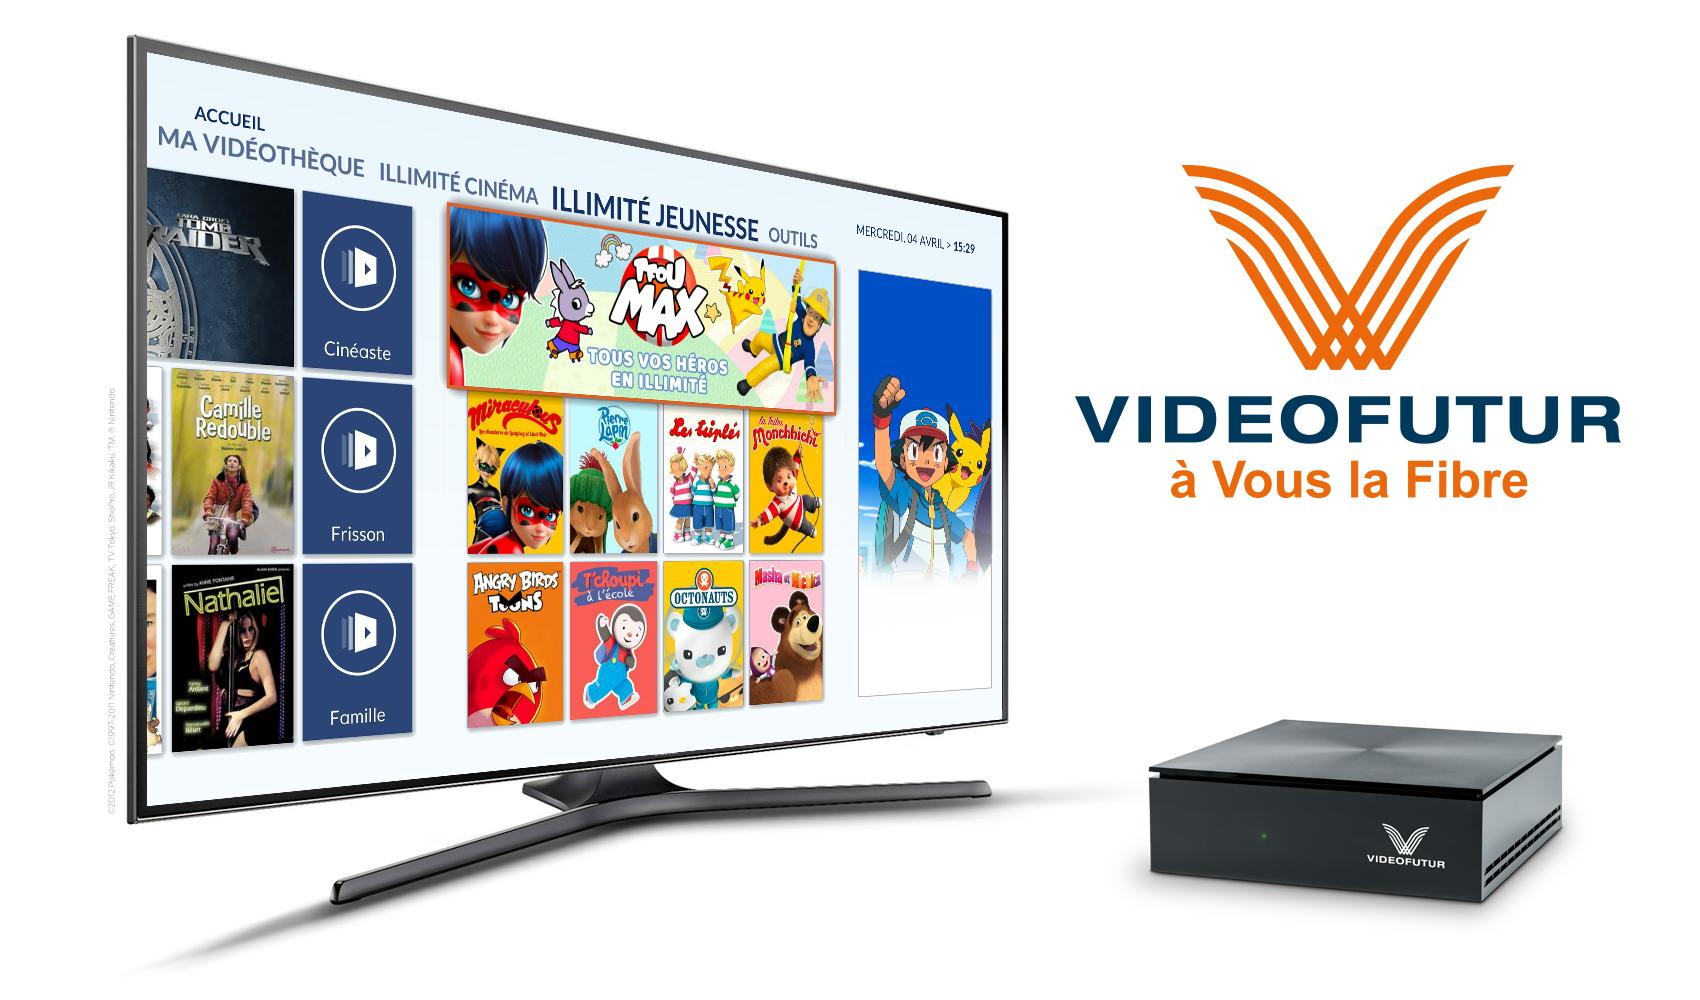 TFOU MAX inclus dans l'offre Fibre de Videofutur